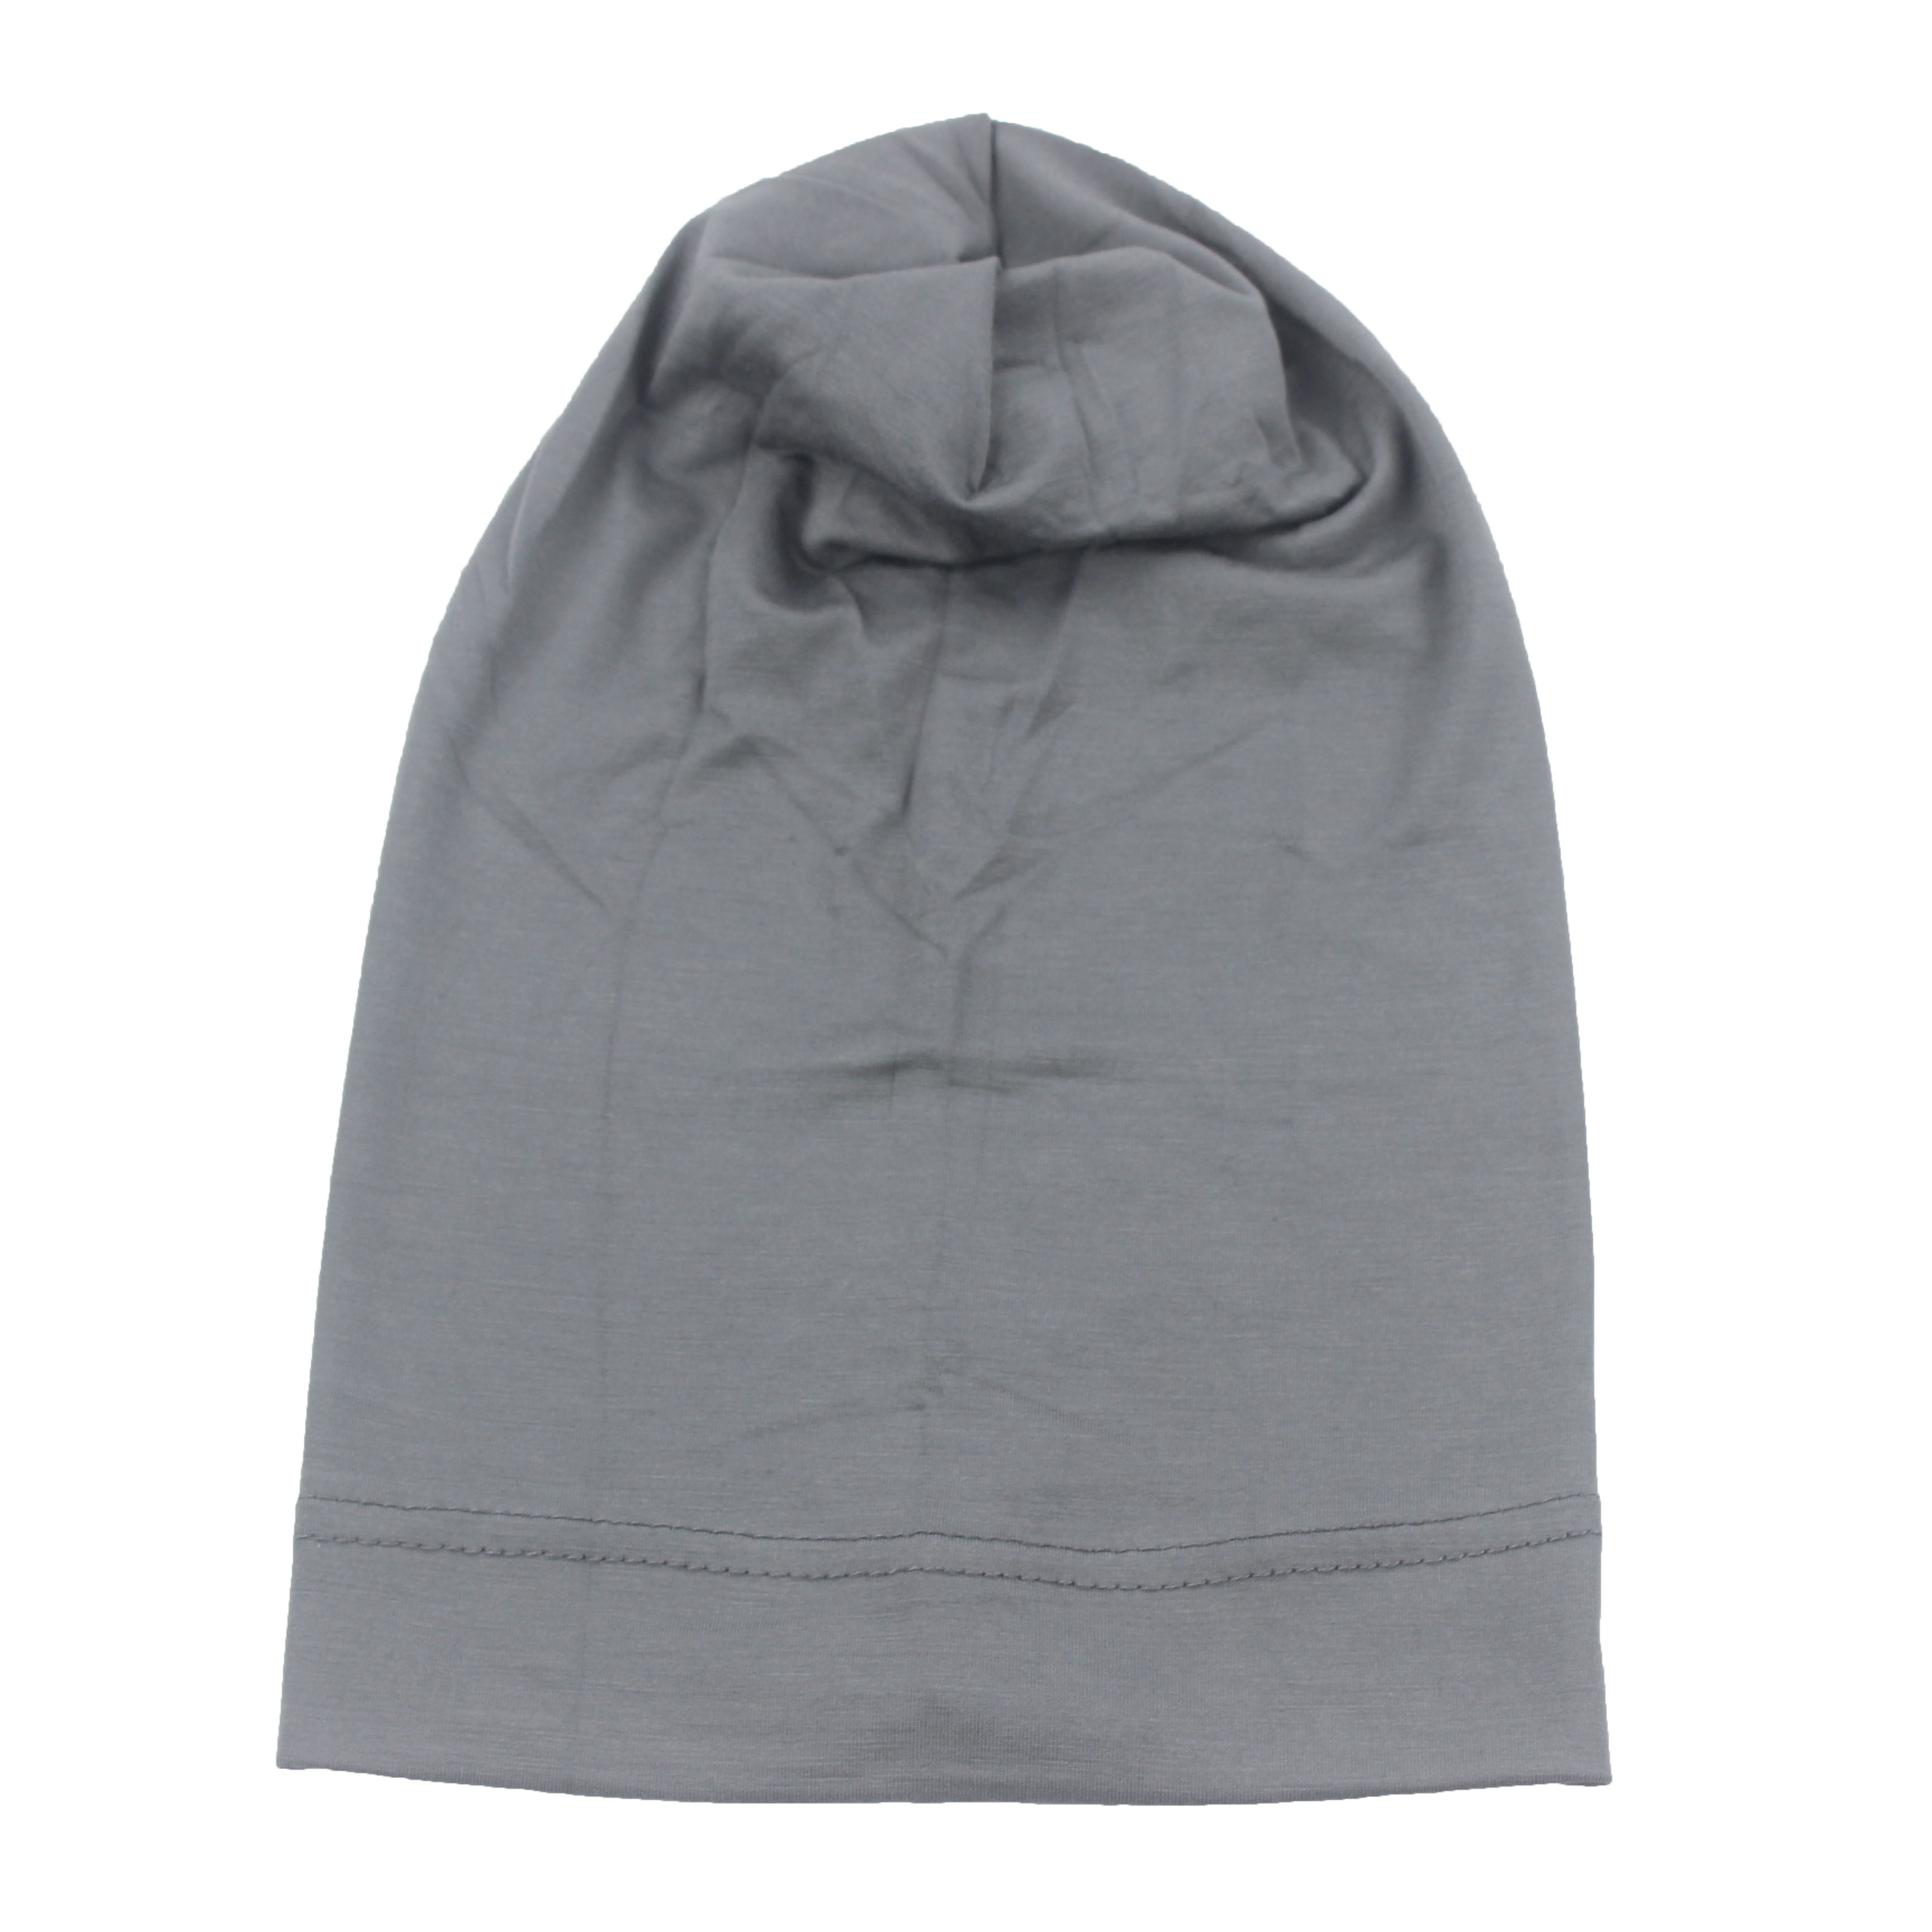 Image 4 - Muslim Women Girls Scarf Cap Cotton Breathable Hat Womens Turban  Elastic Cloth Head Cap Hat Ladies Hair Accessories WholesaleIslamic  Clothing